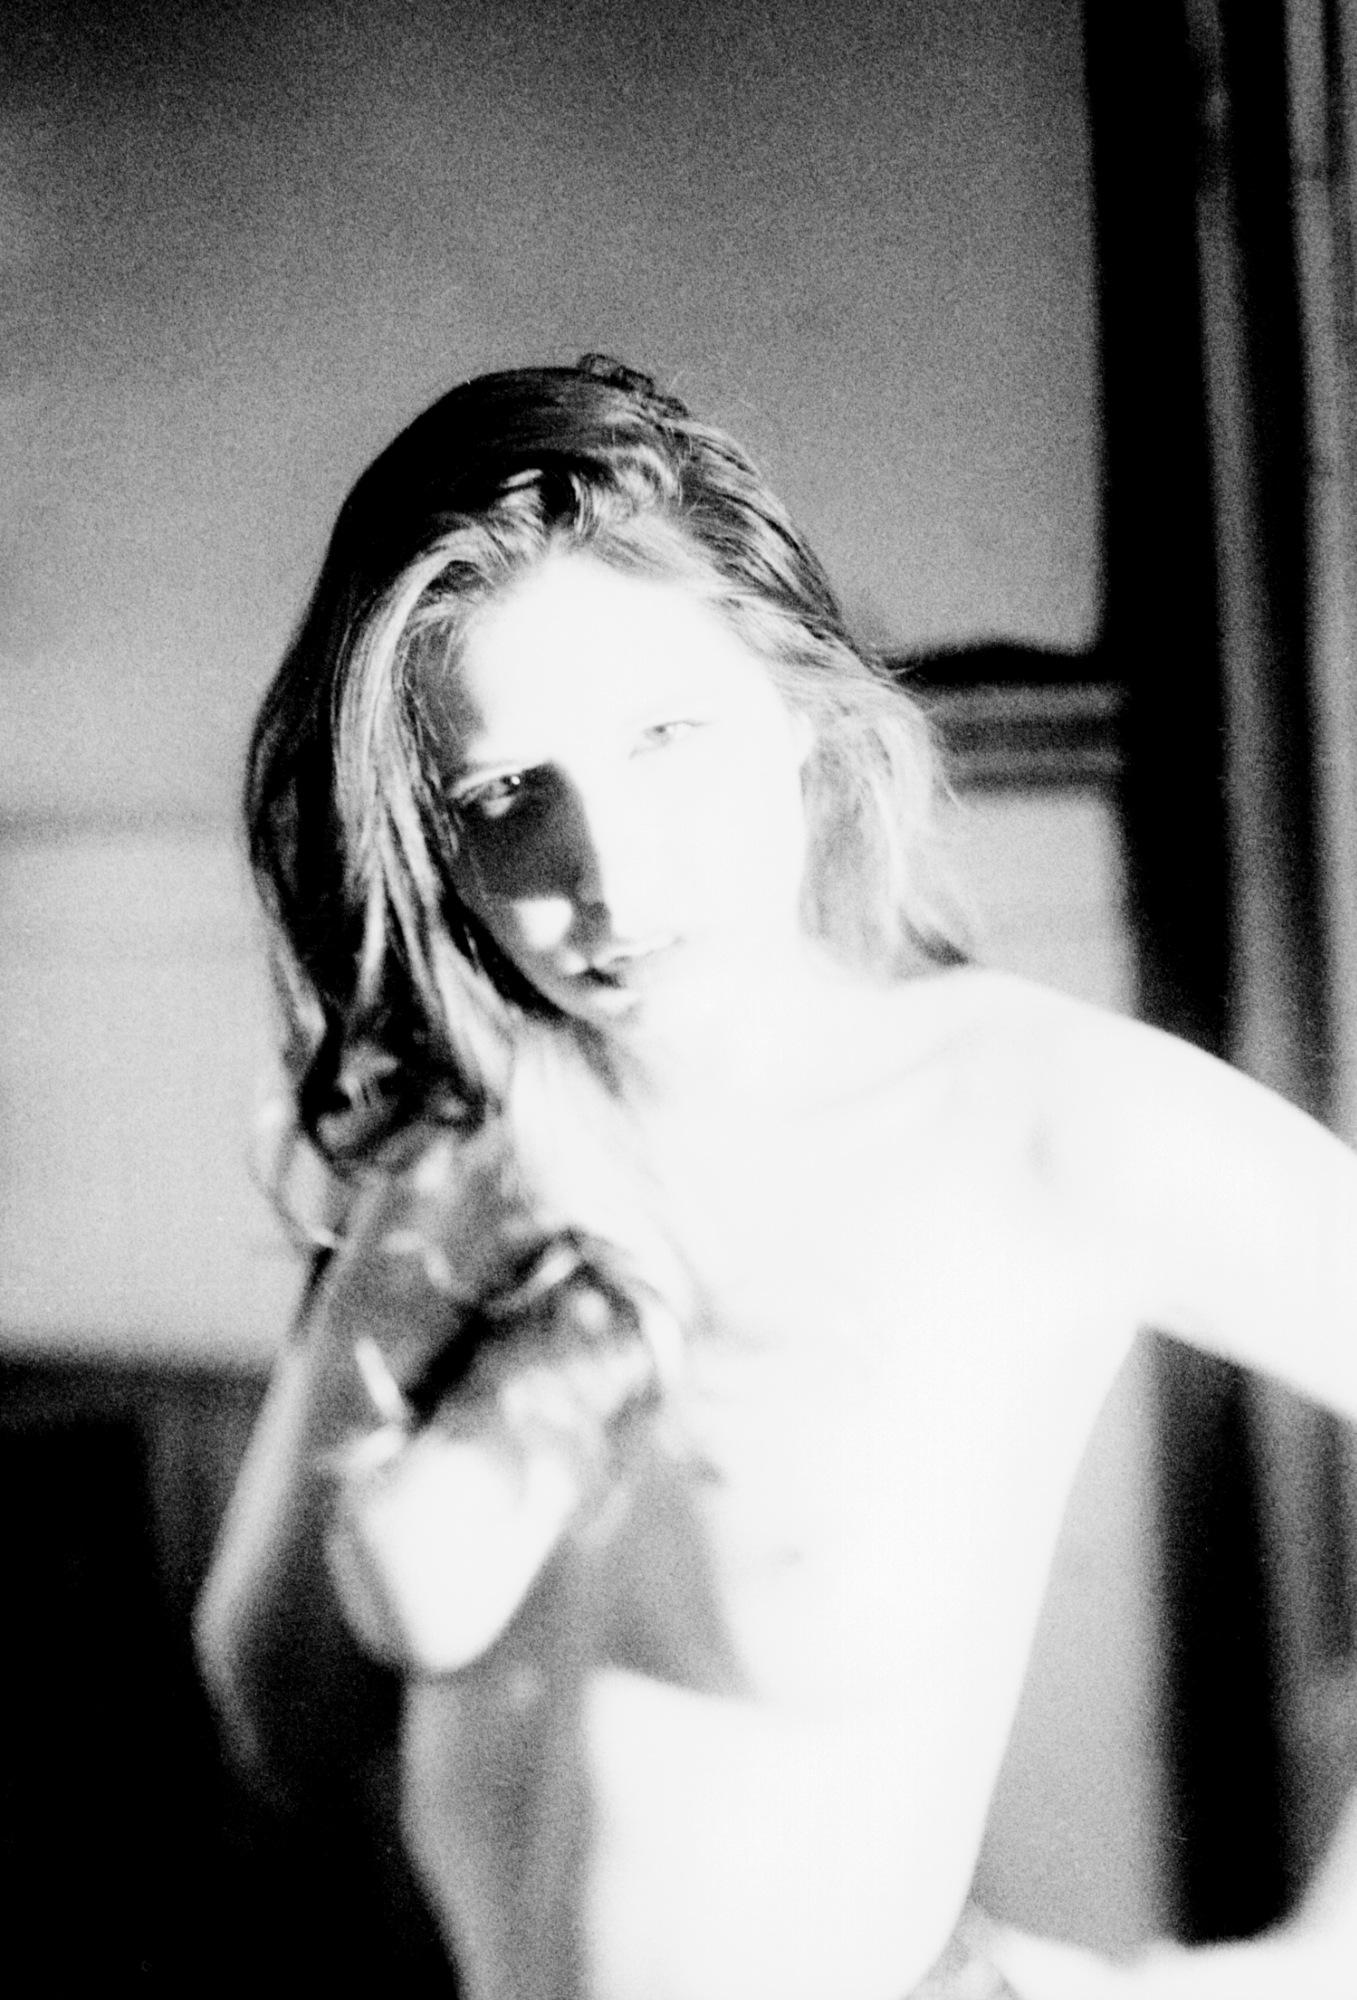 35mm film. by d.l. roth